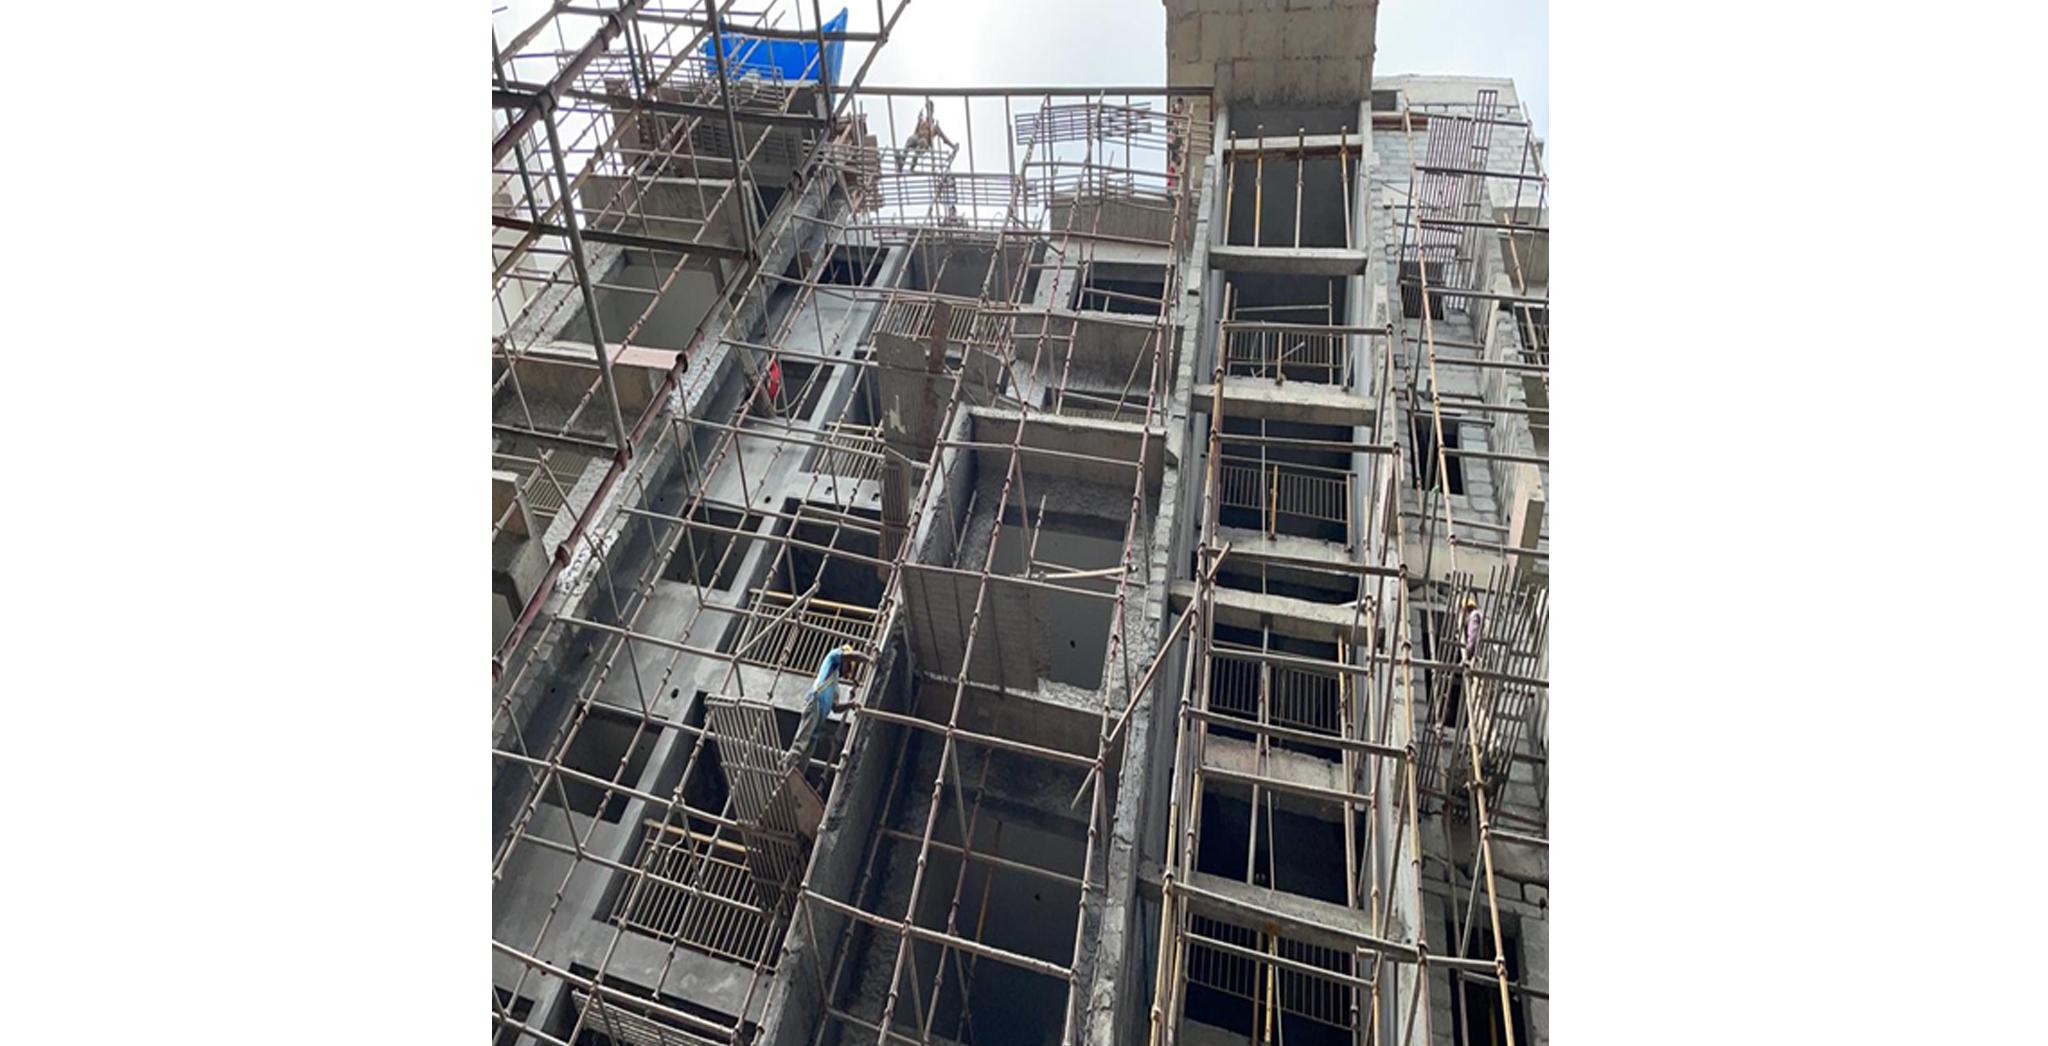 Aug 2021 - S Block: South Elevation External Plastering work in progress